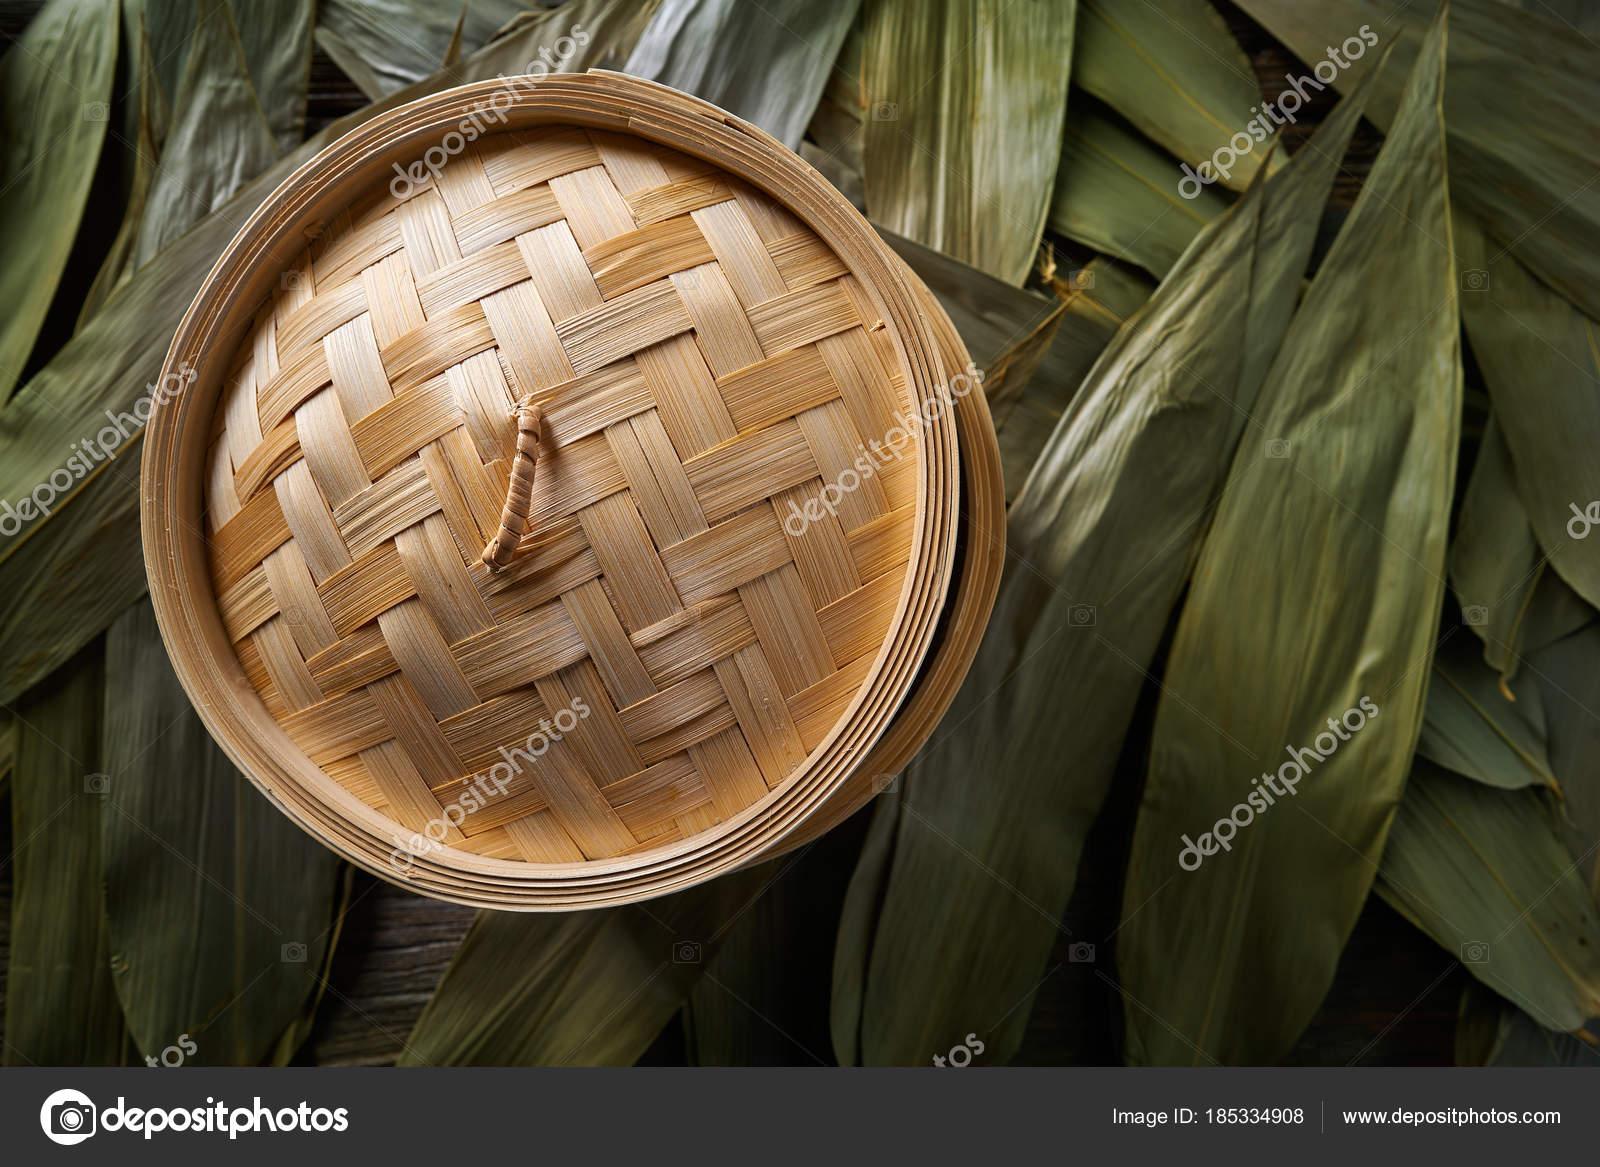 Asiatische Kuche Bambus Dampfgarer Fur Dampfgaren Stockfoto C Tono